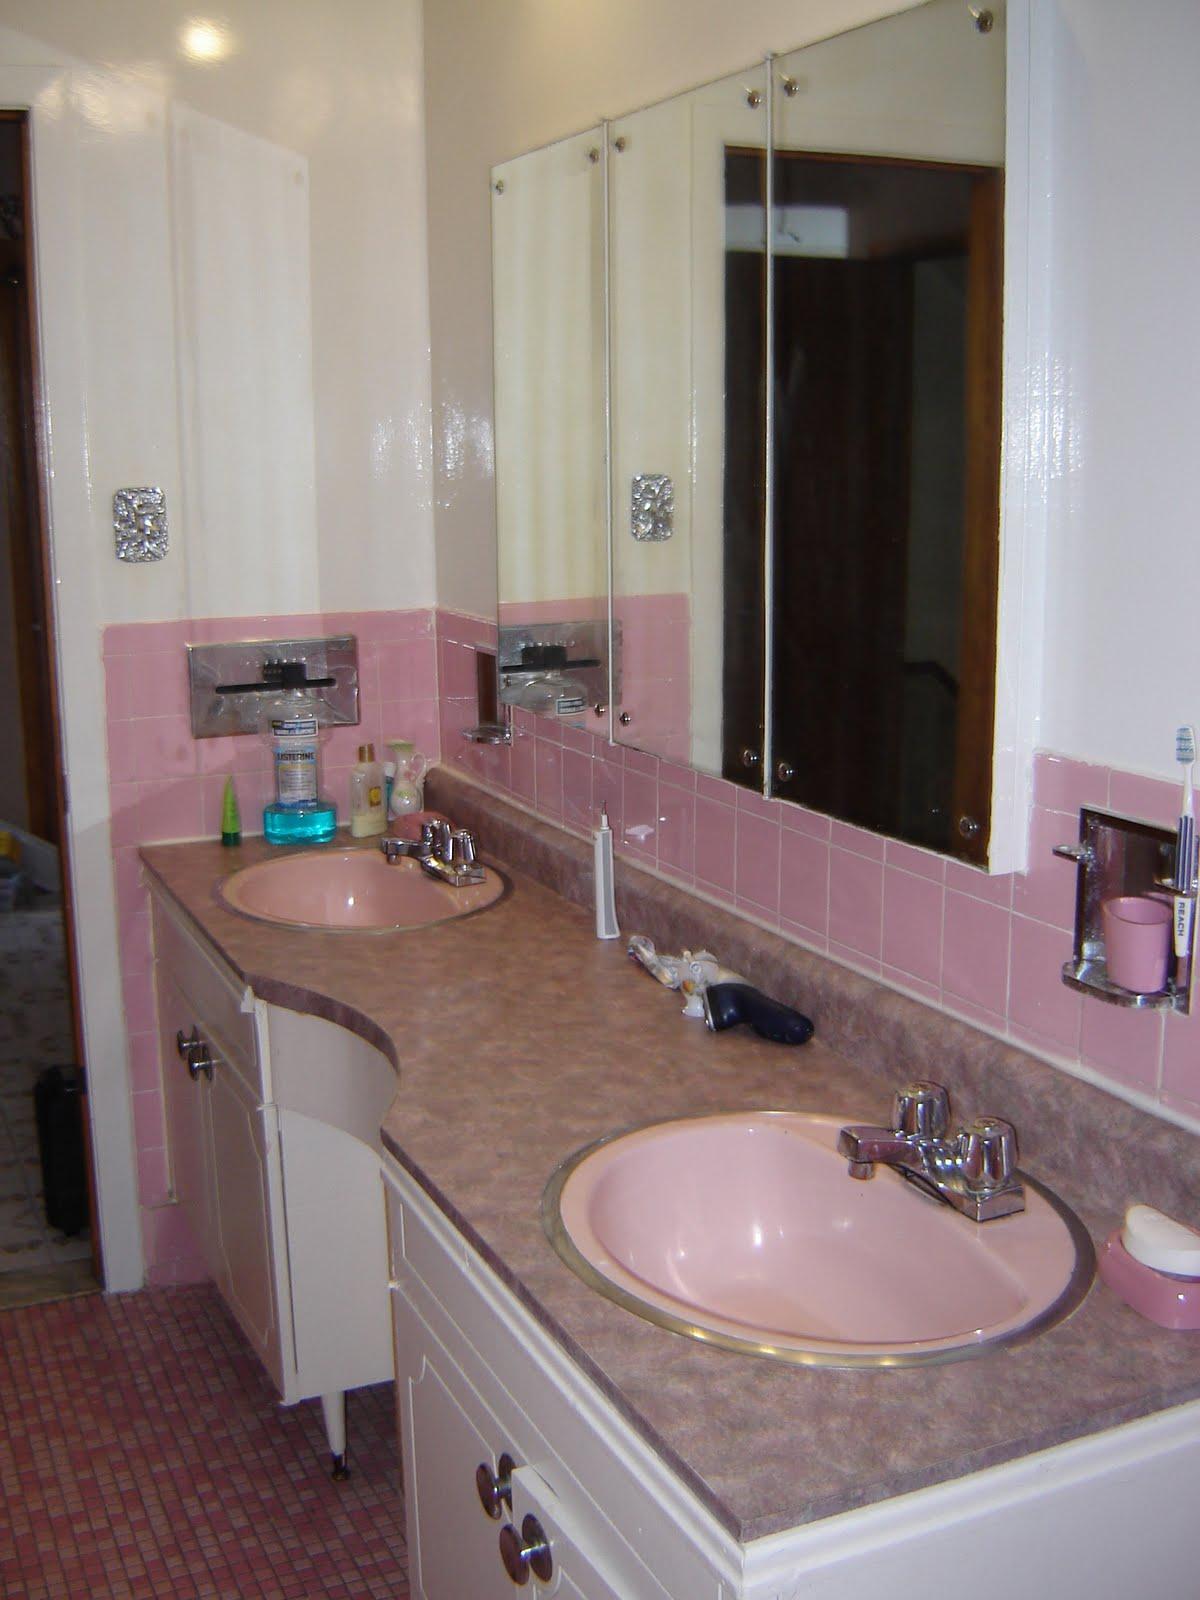 Superior Gorgeous Complete Bathroom Transformation; Gut U0026 Rebuild!